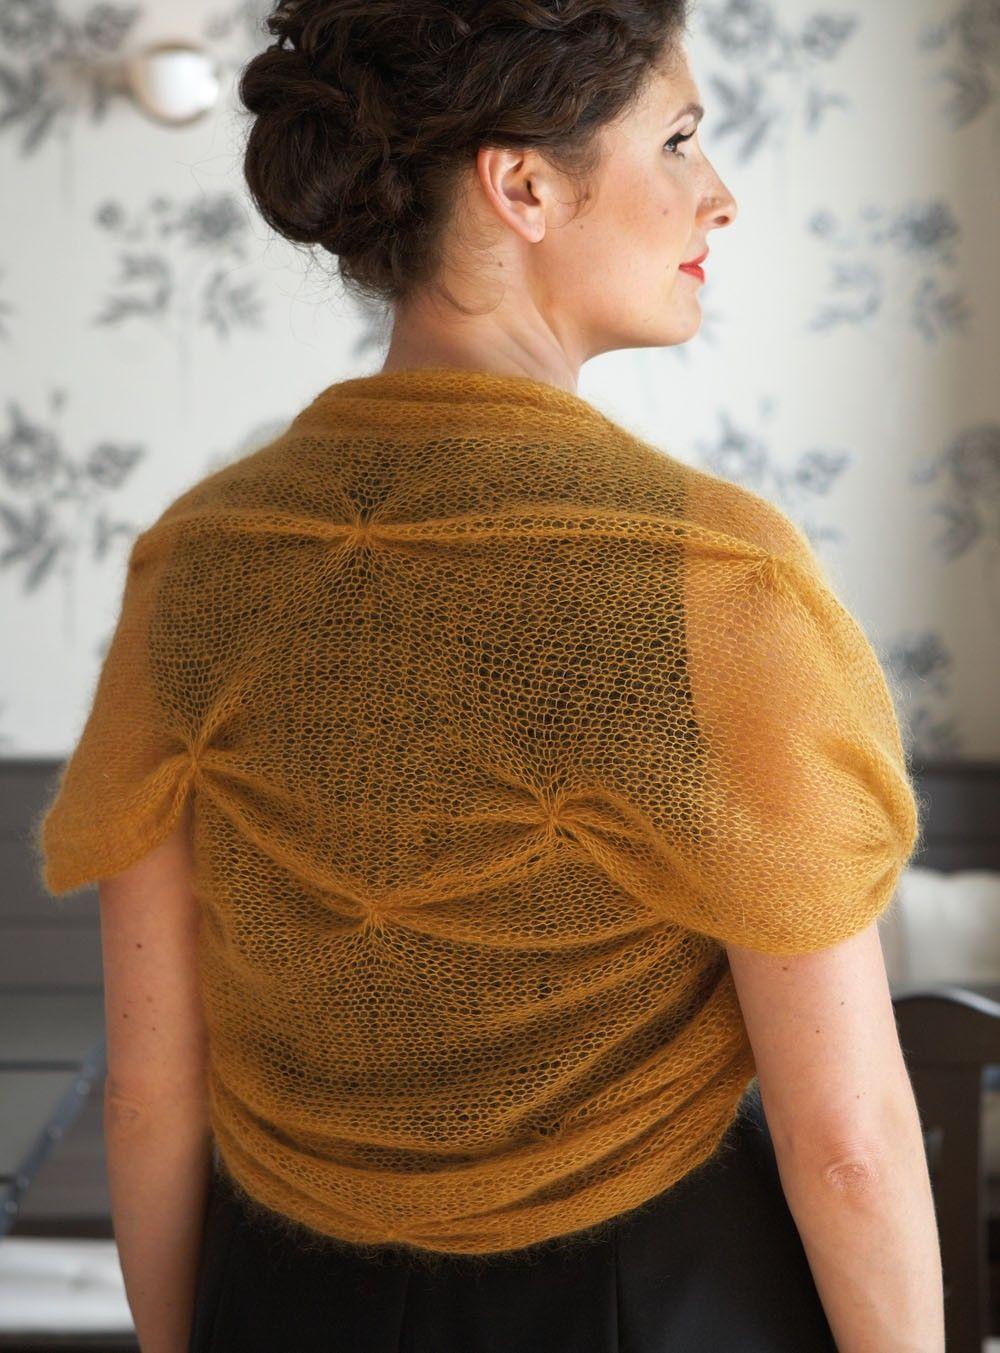 Safran Shrug (Knit) | pre mna | Pinterest | Chrochet, Knit patterns ...